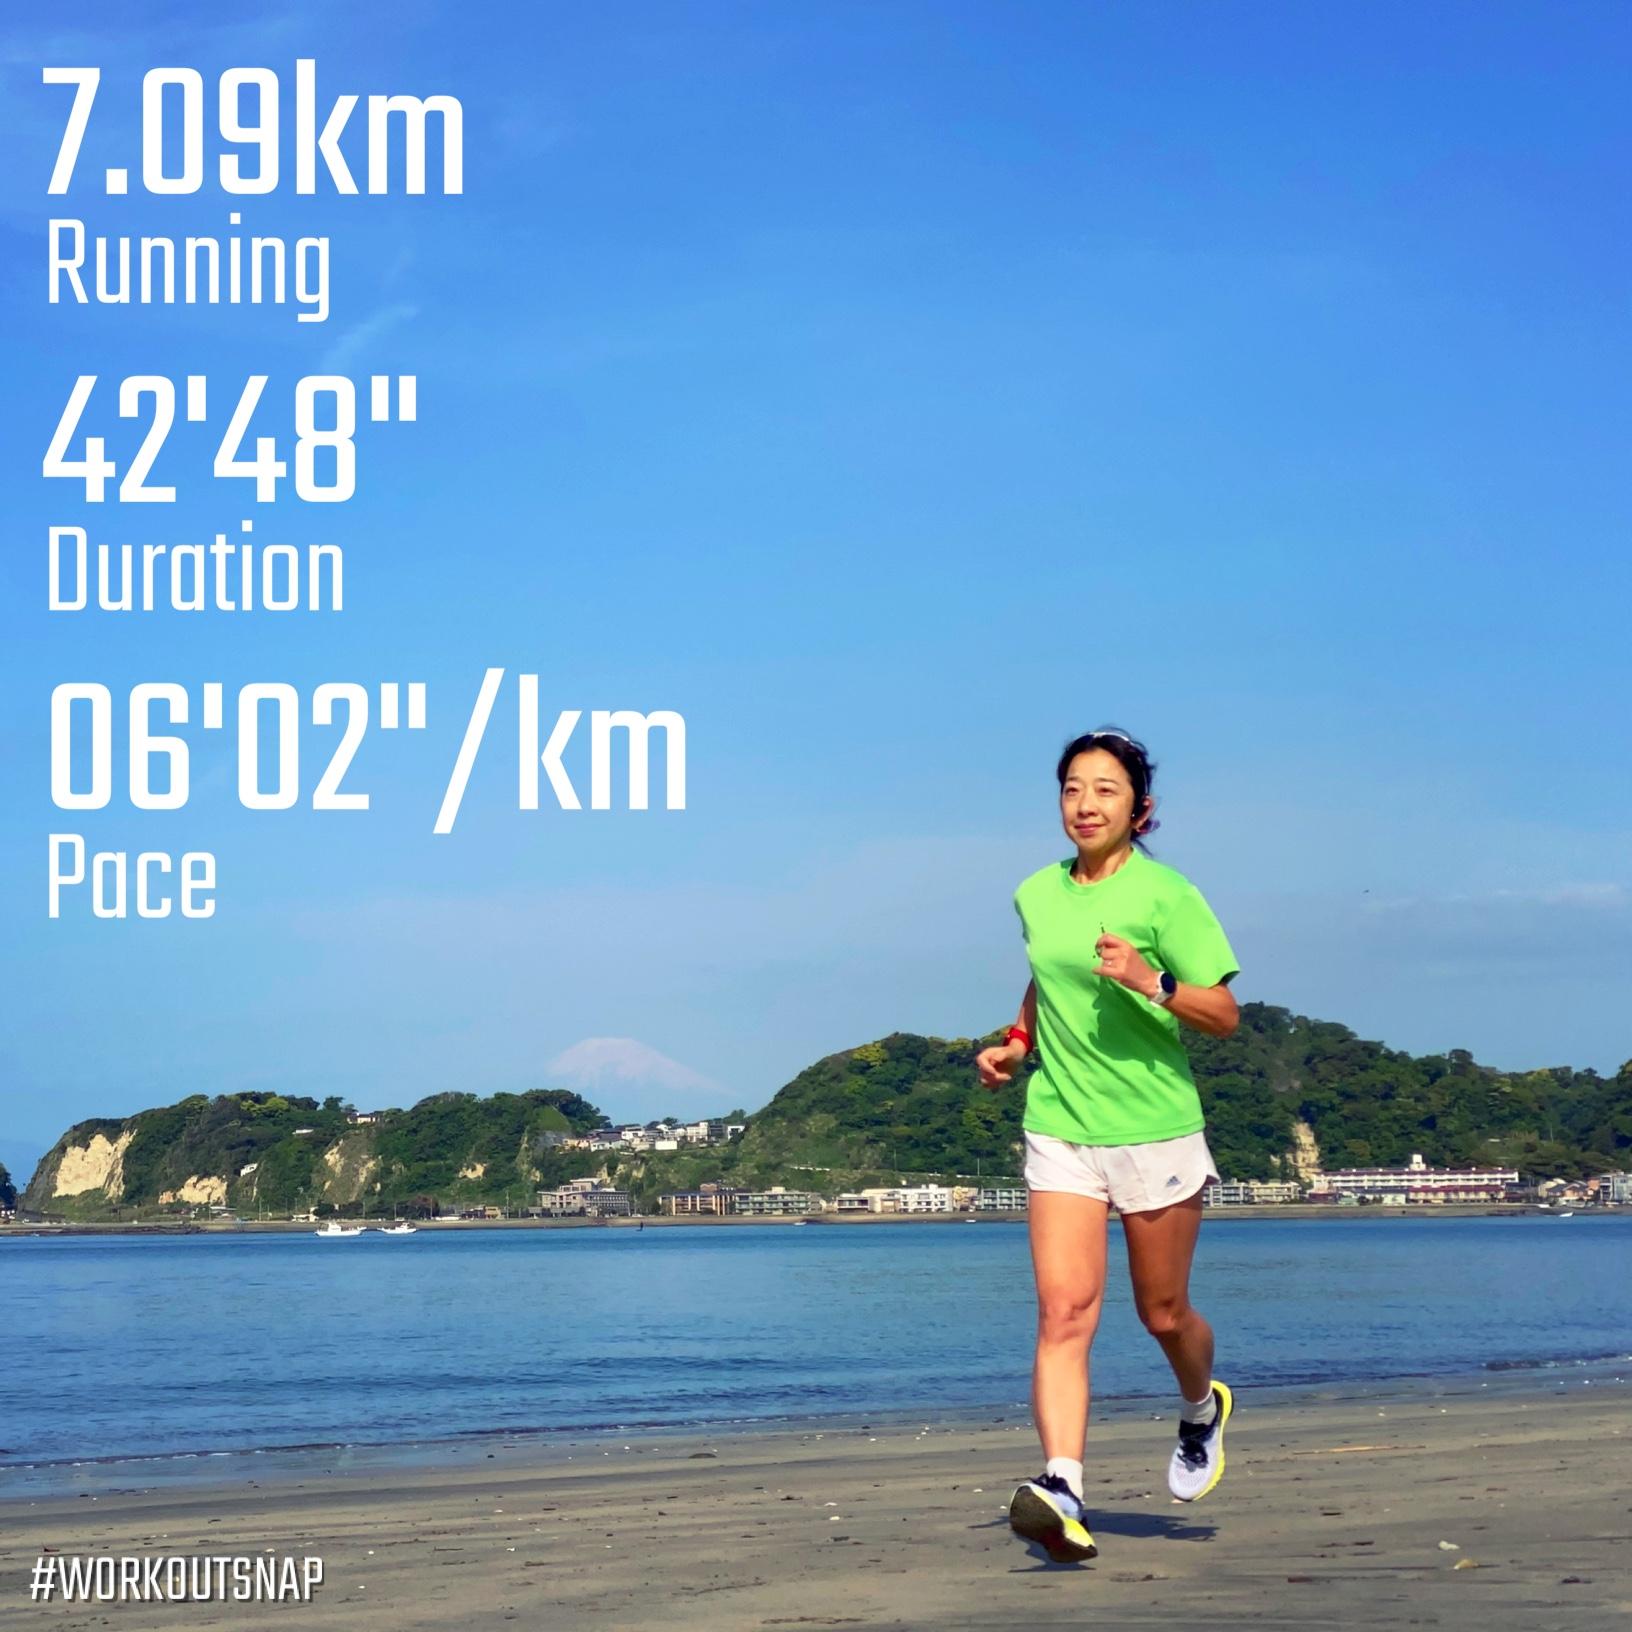 "7.09km(6'02"") イージーラン【2021/4/27】in材木座海岸"